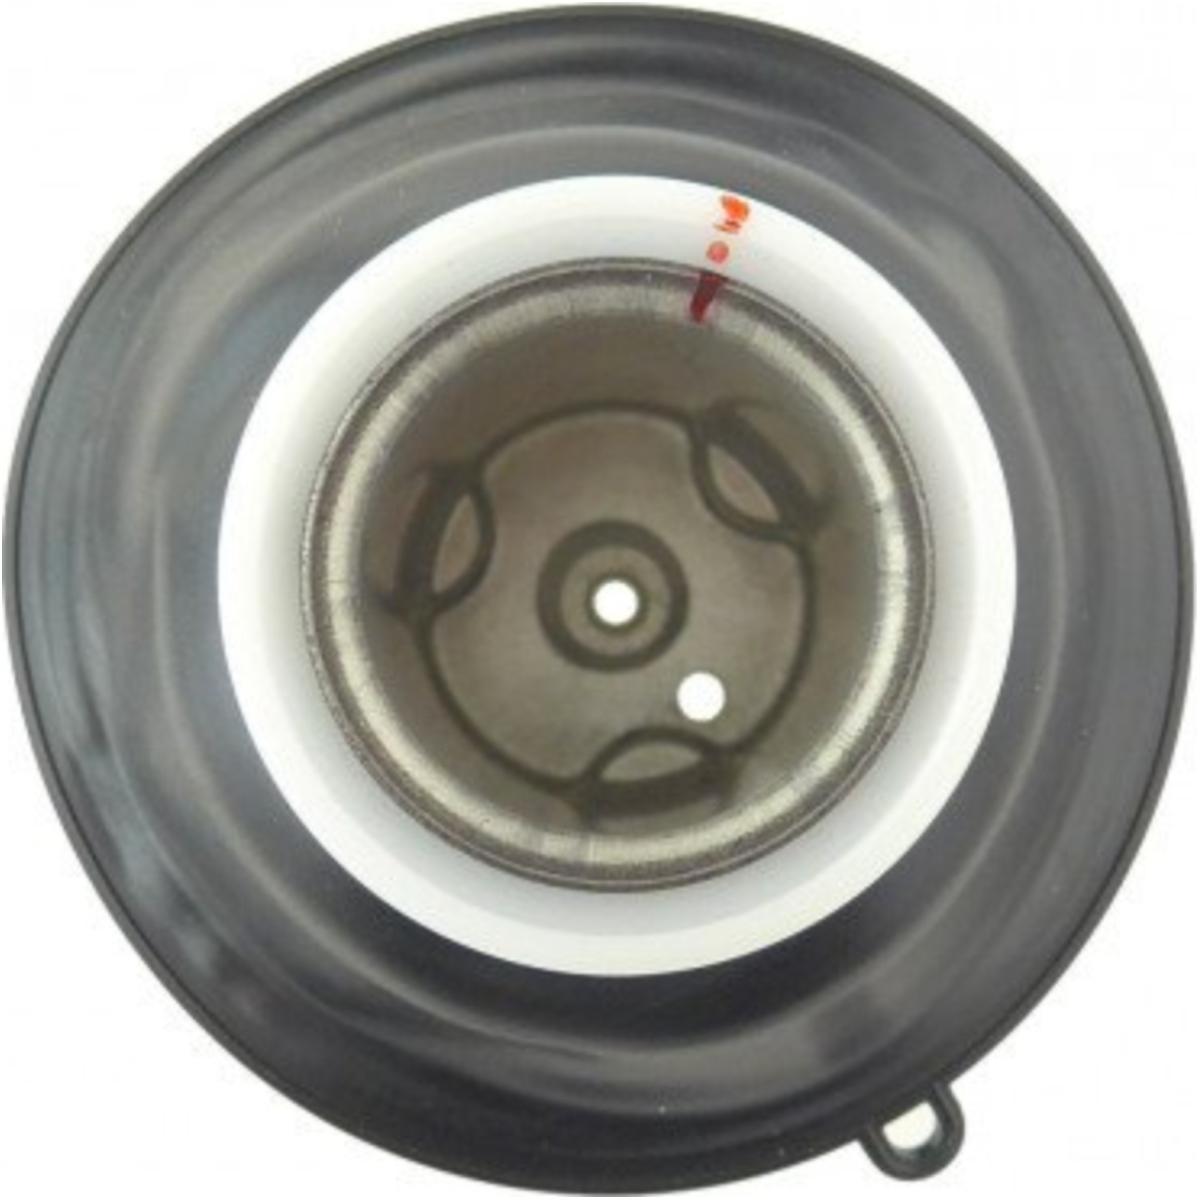 Throttle valve with diaphragm 16111MF5841